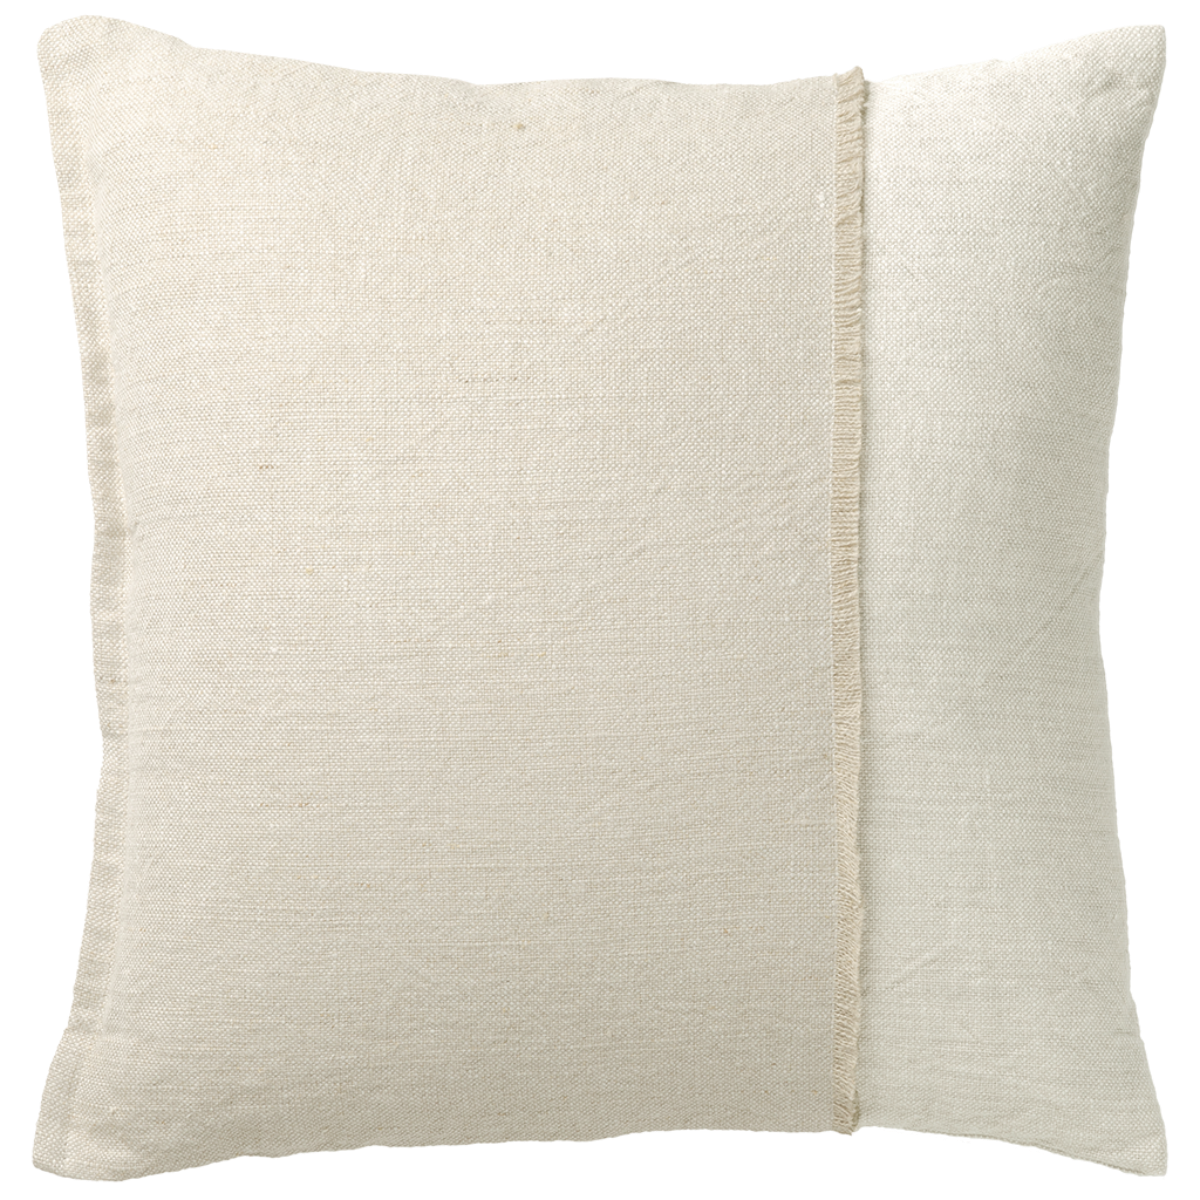 de Le Cuona   Haiku Panel Cushion With Fringe Detail Husk/Paper